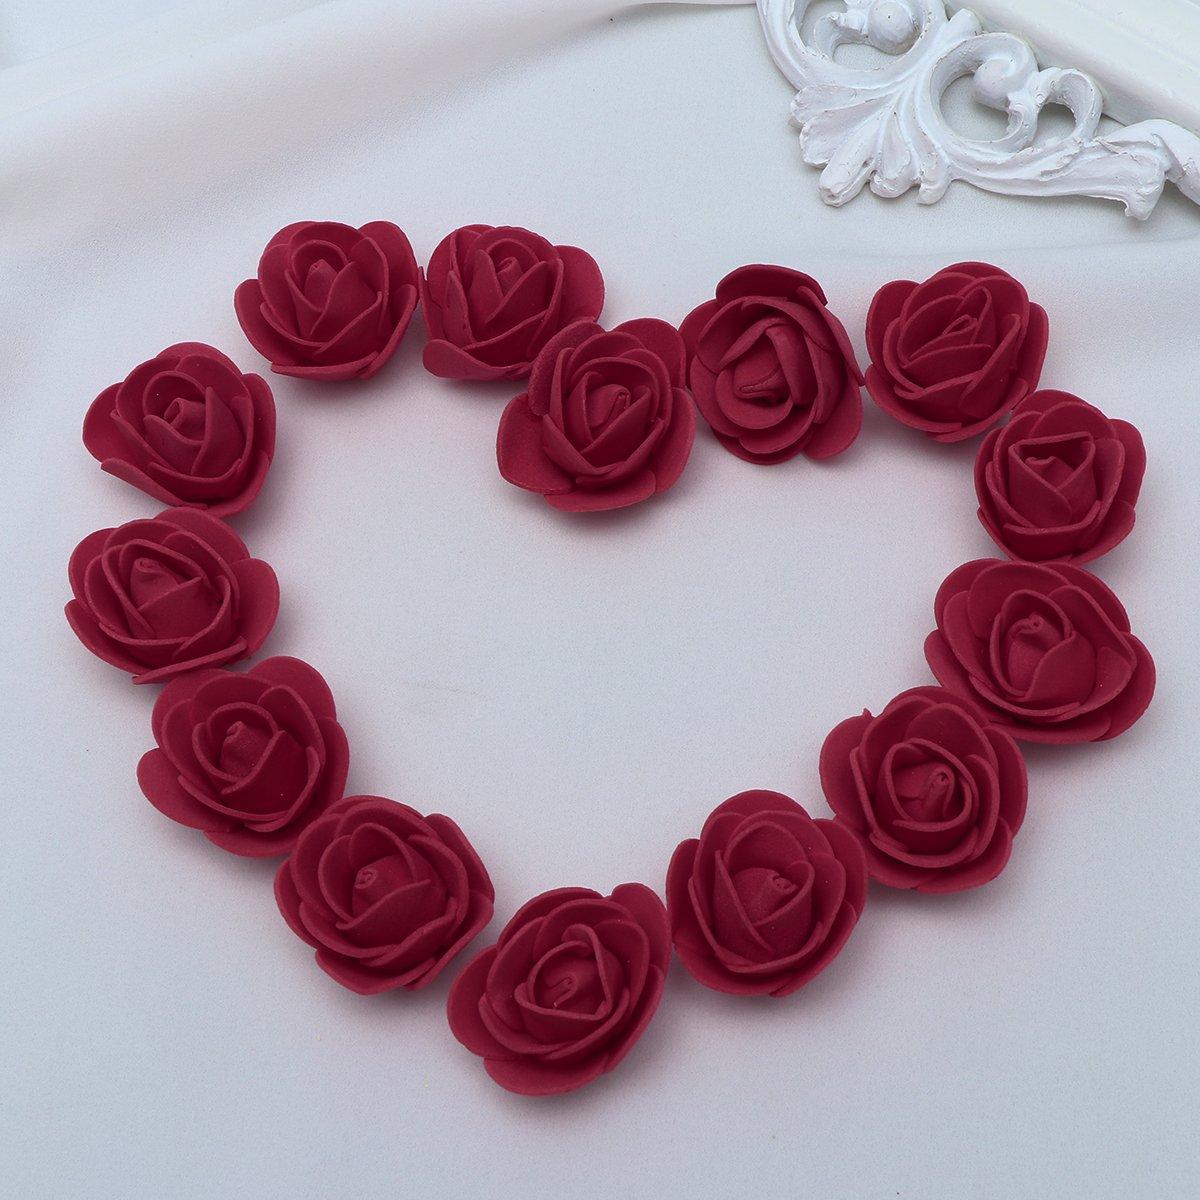 39fcc6c88a9 KODORIA 100pcs Artificial Foam Rose Head Artificial Rose Flower for DIY  Bouquets Wedding Party Home Decoration - Dark Red - Silk Flower Arrangements